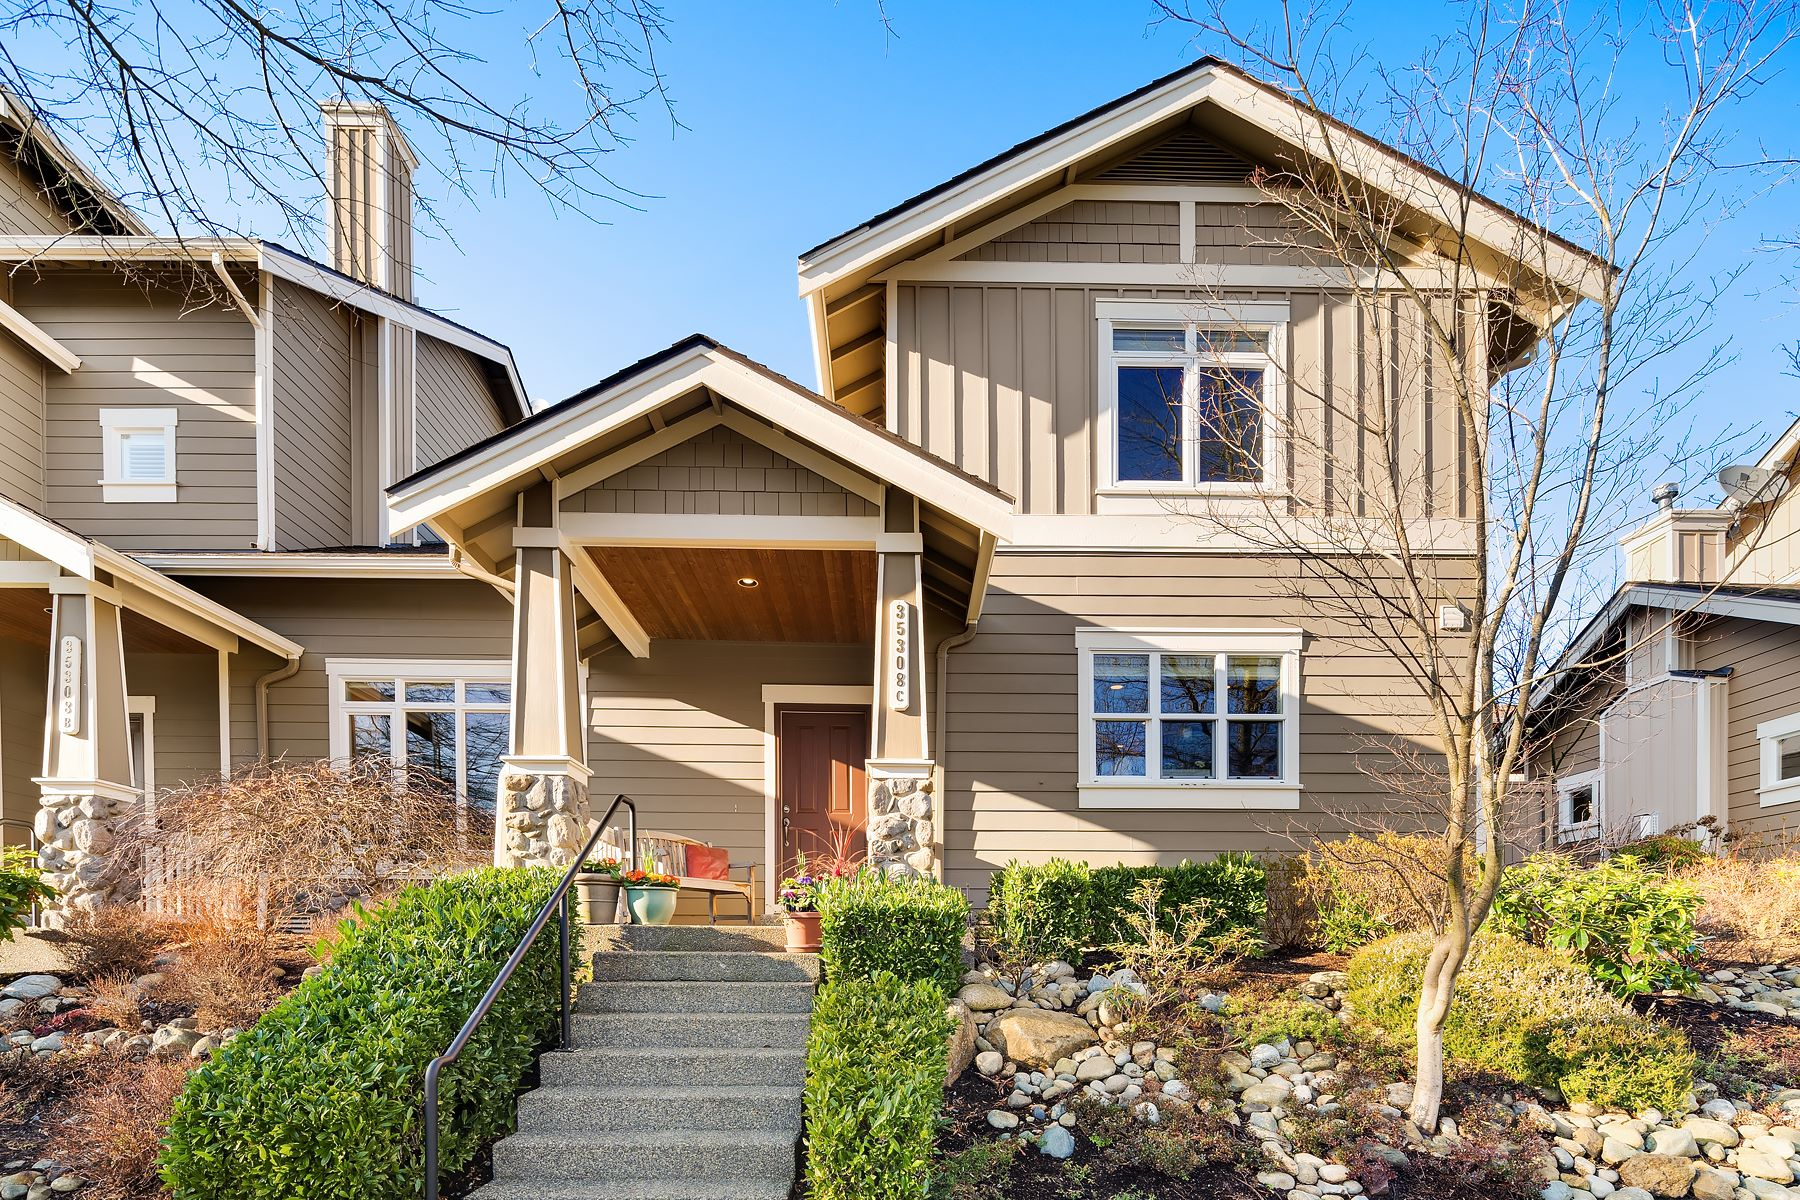 Single Family Homes for Sale at Sensational Snoqualmie Ridge Craftsman 35308 SE Ridge St Unit #C Snoqualmie, Washington 98065 United States